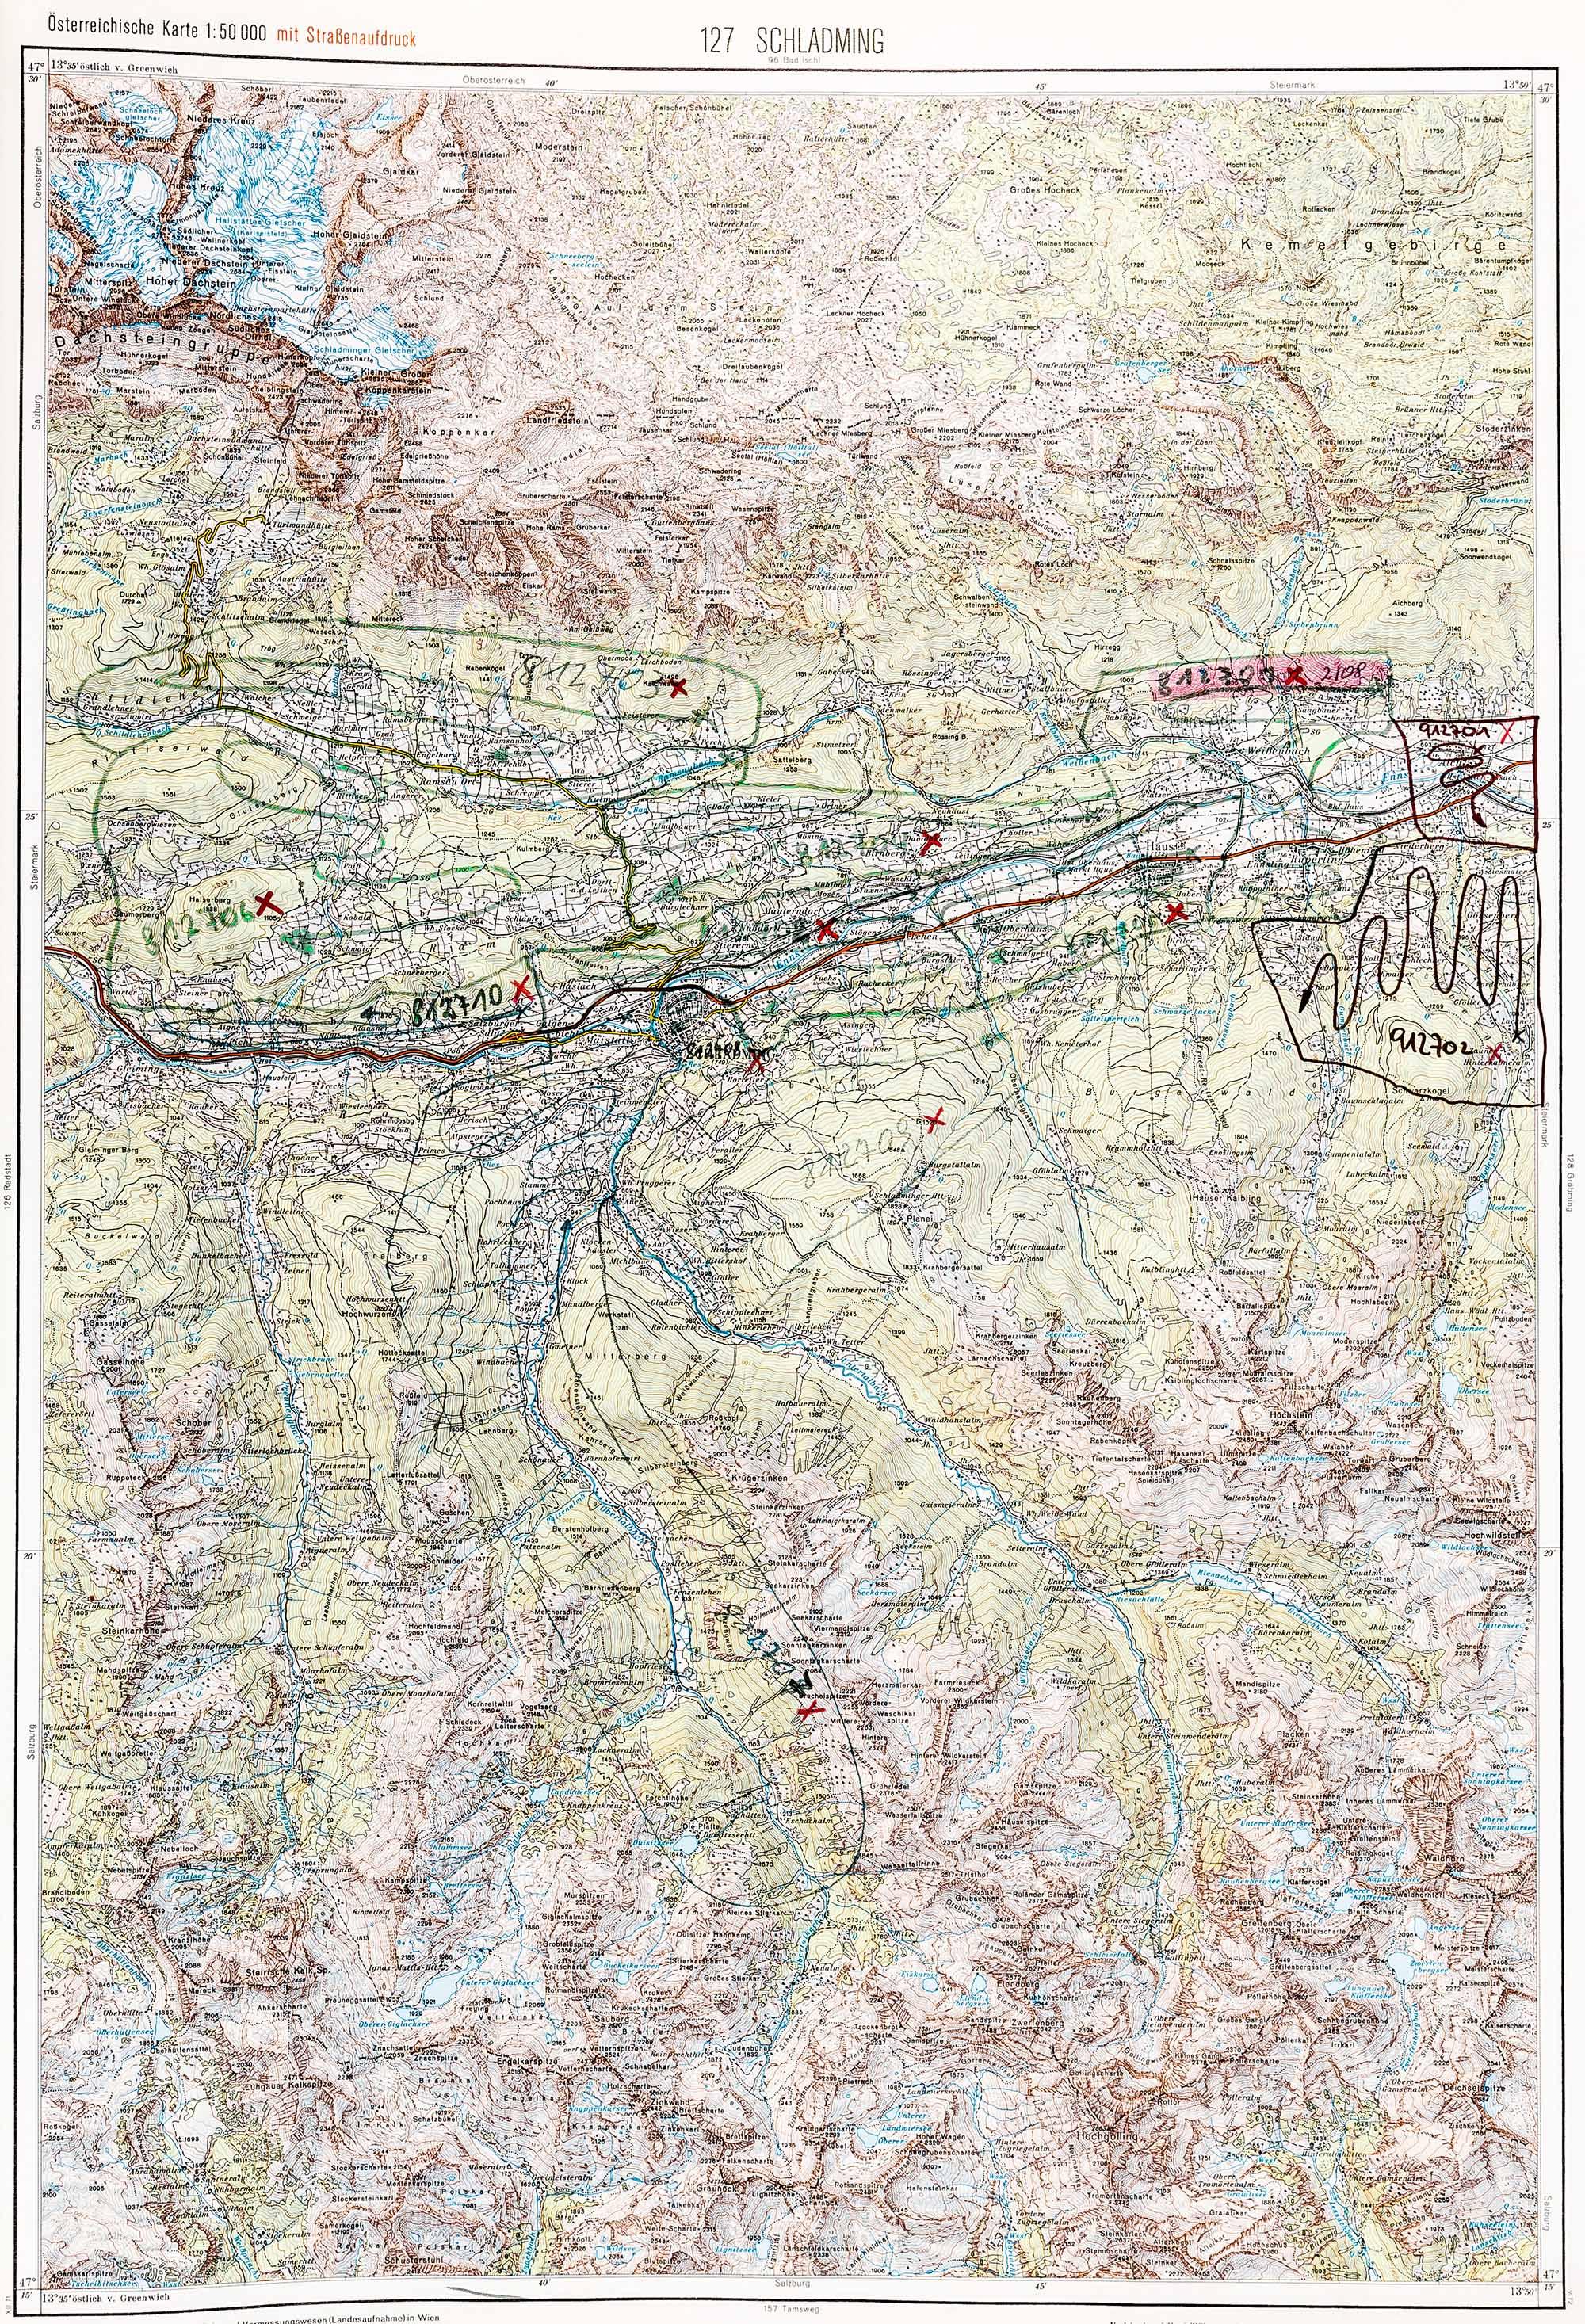 1975-1979 Karte 127